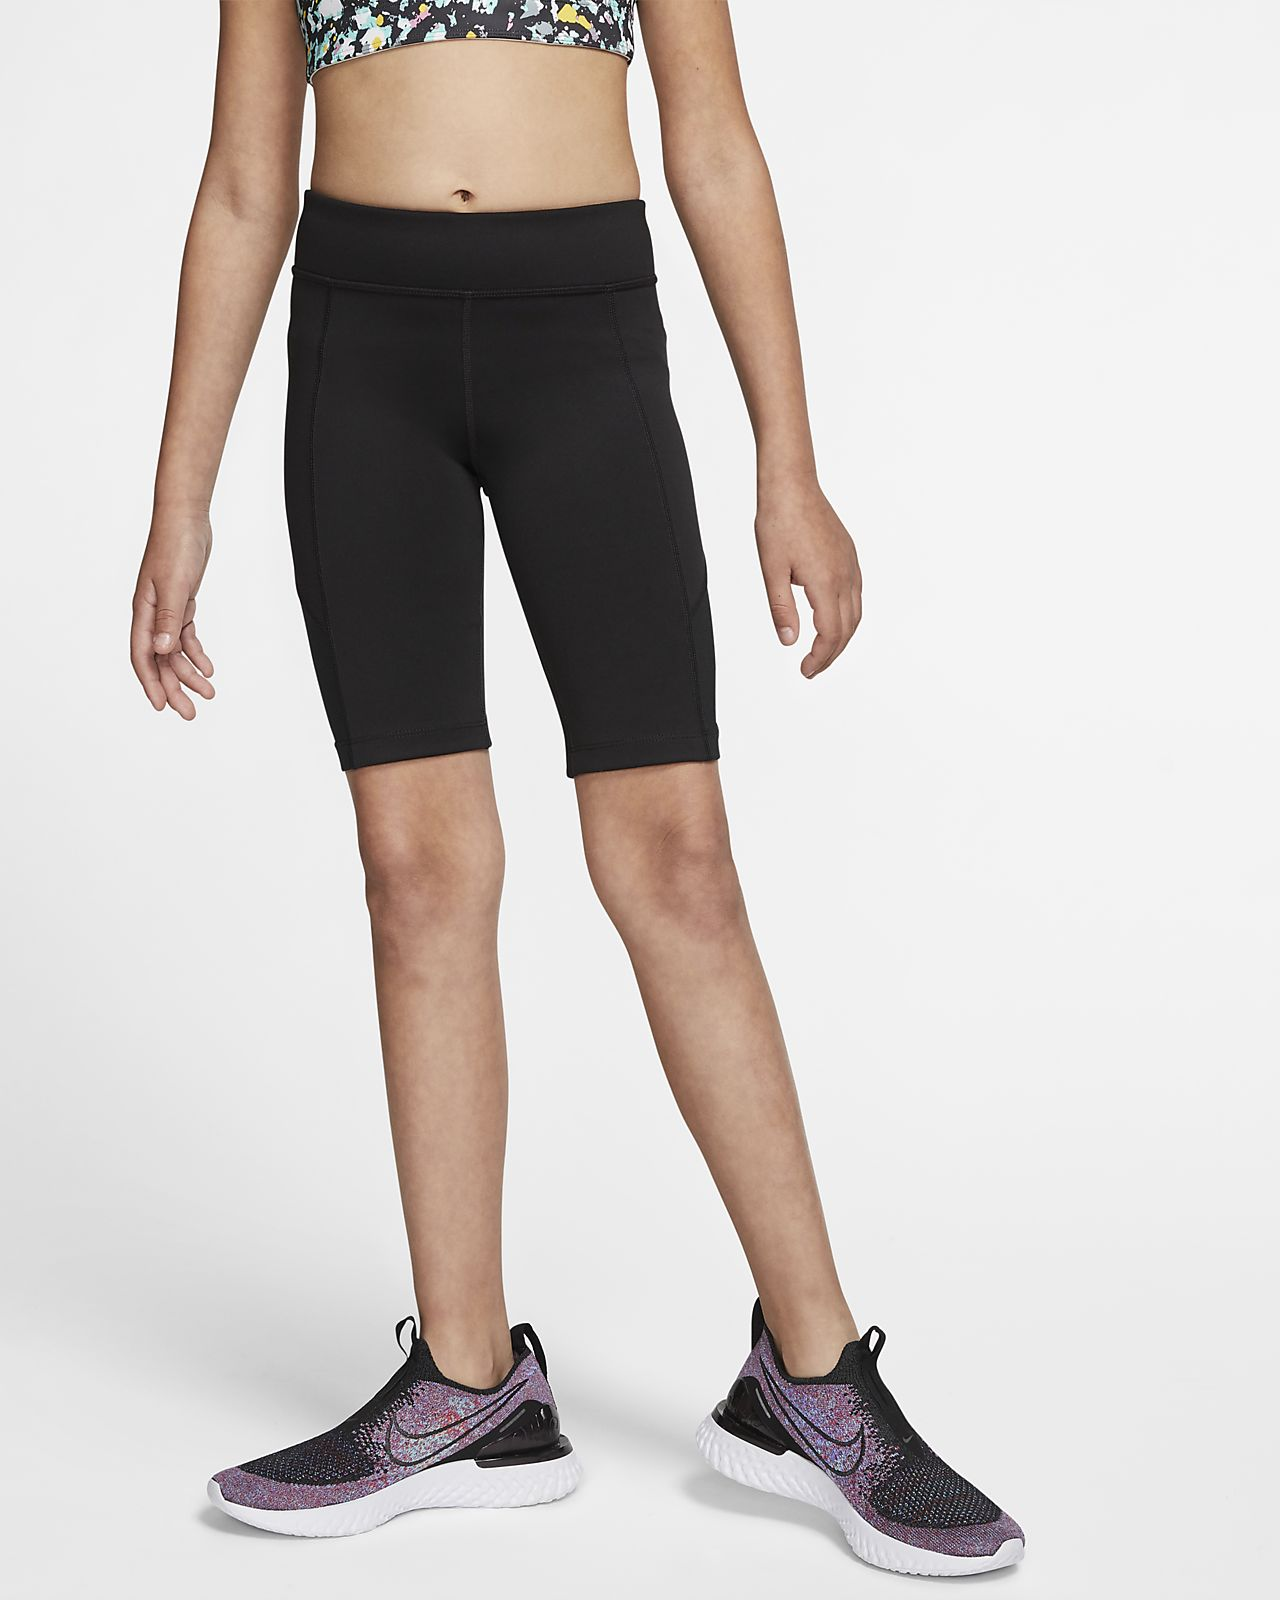 Nike Trophy Big Kids' (Girls') Training Shorts